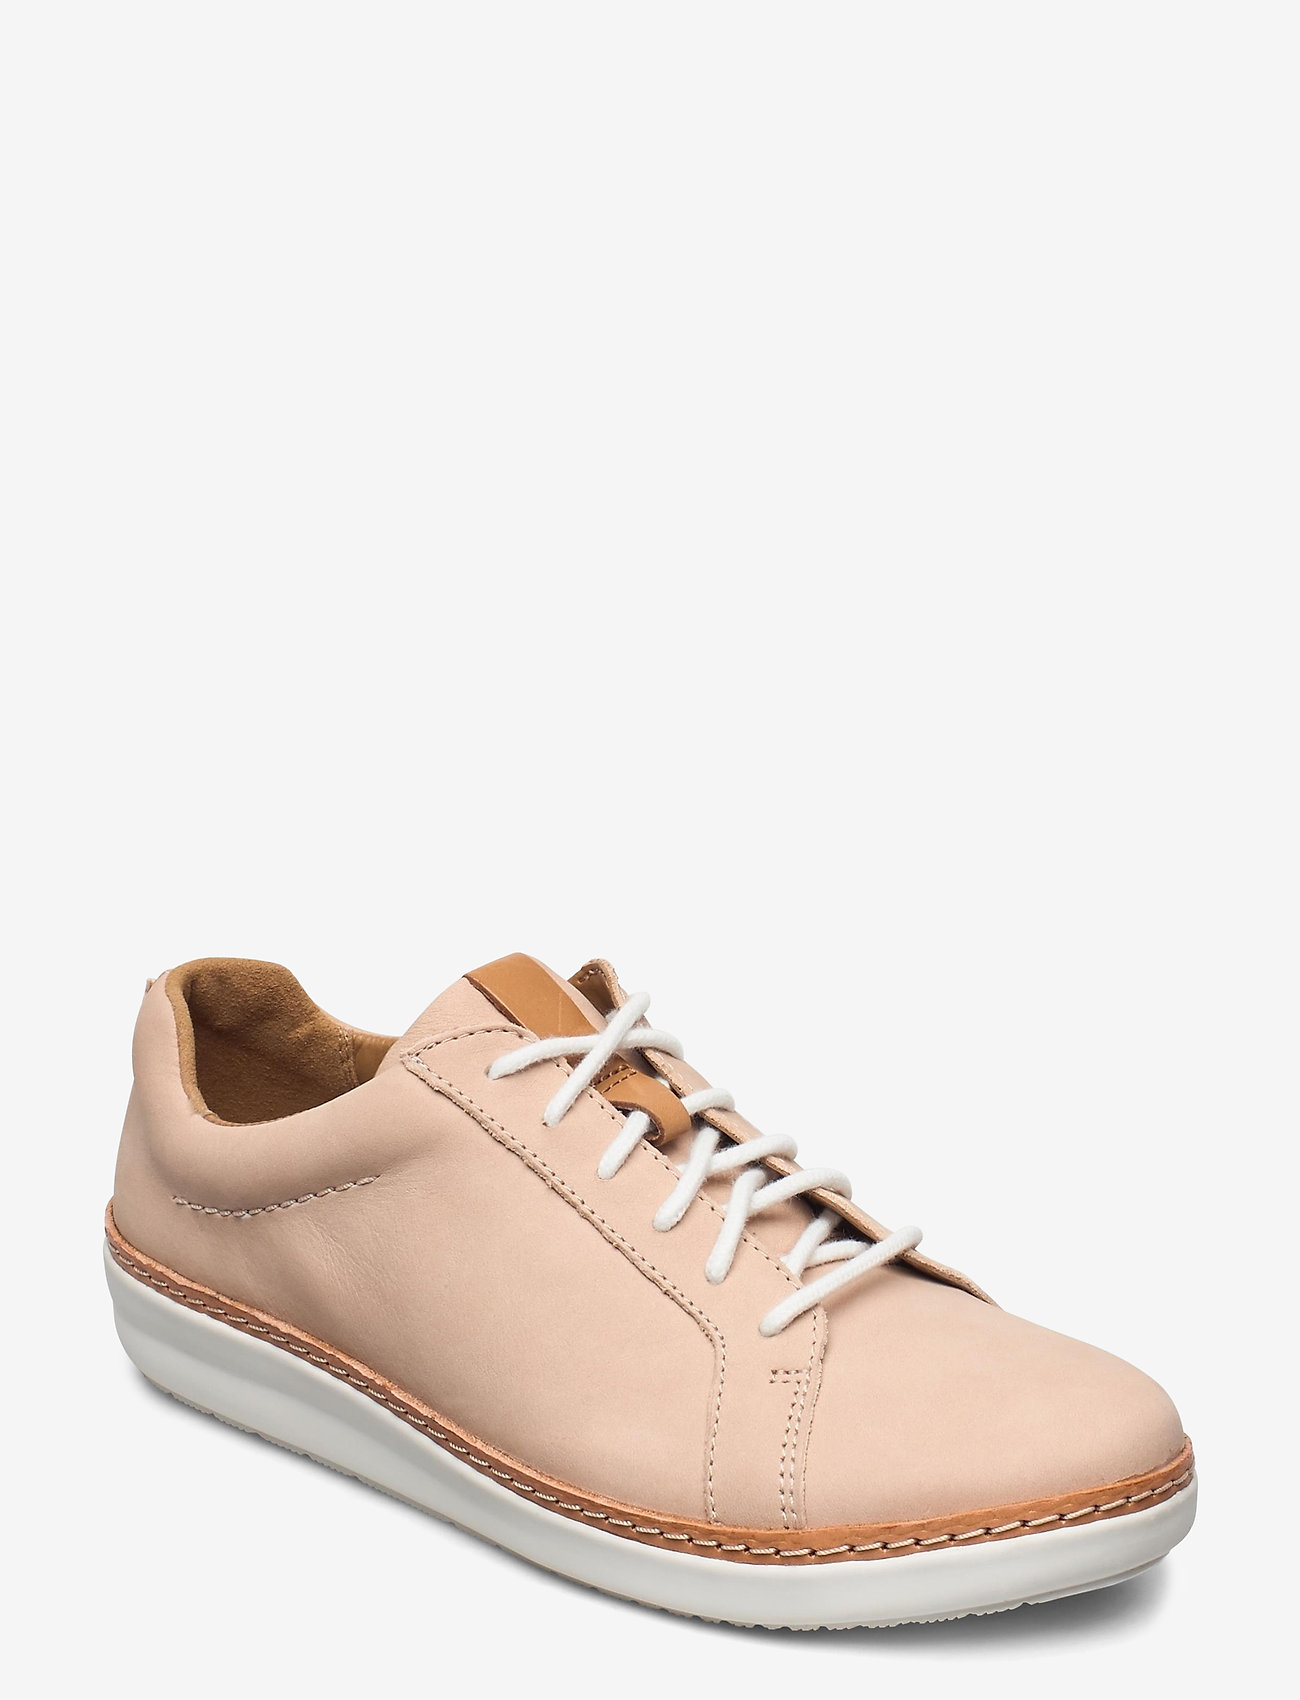 Clarks - Amberlee Rosa - låga sneakers - nude nubuck - 0